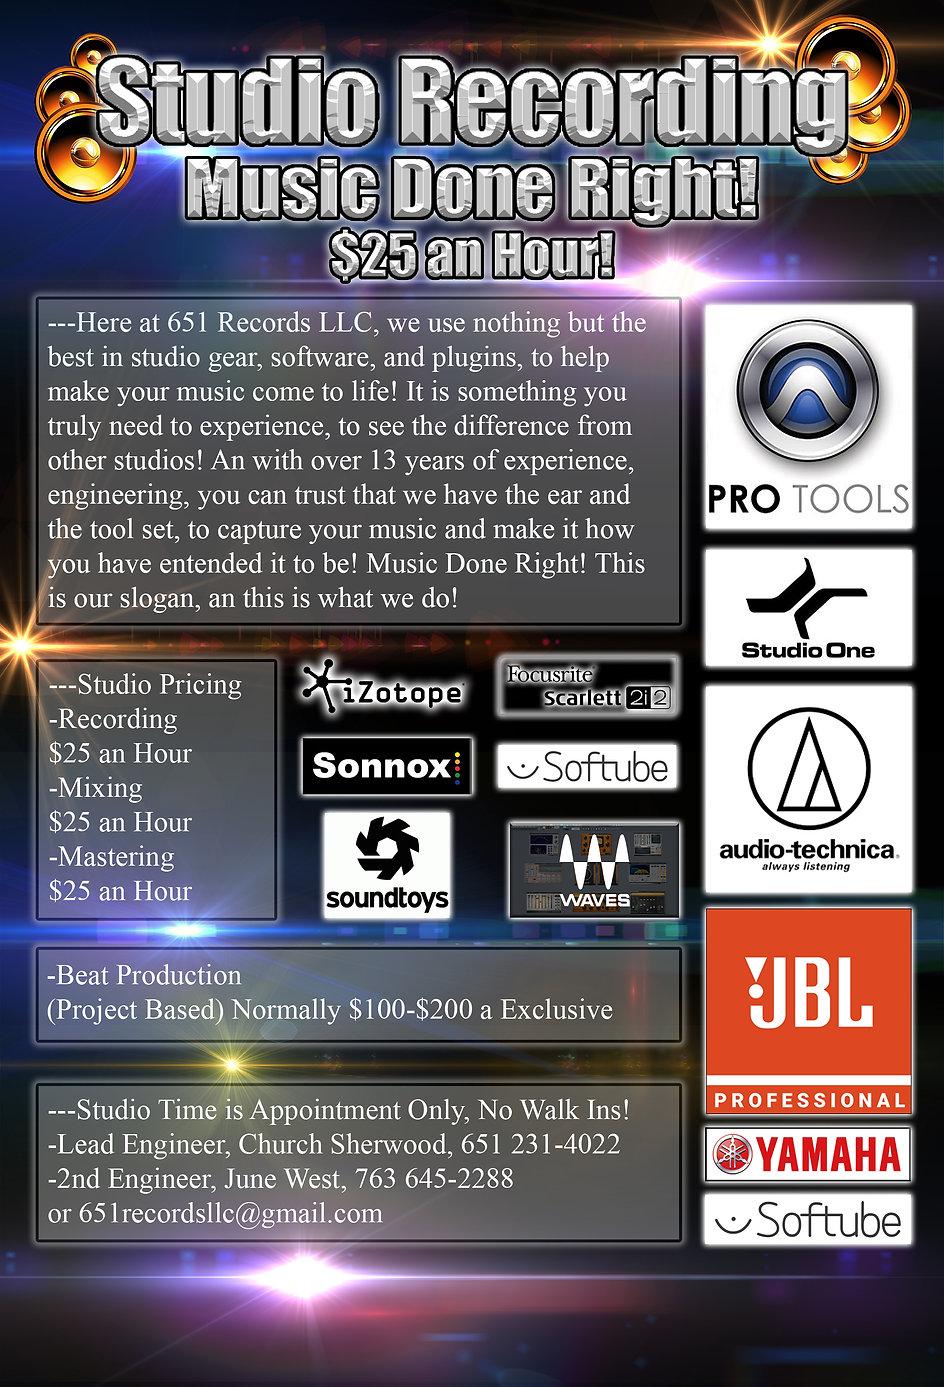 7-11-2020 Studio Recording Page, Music D